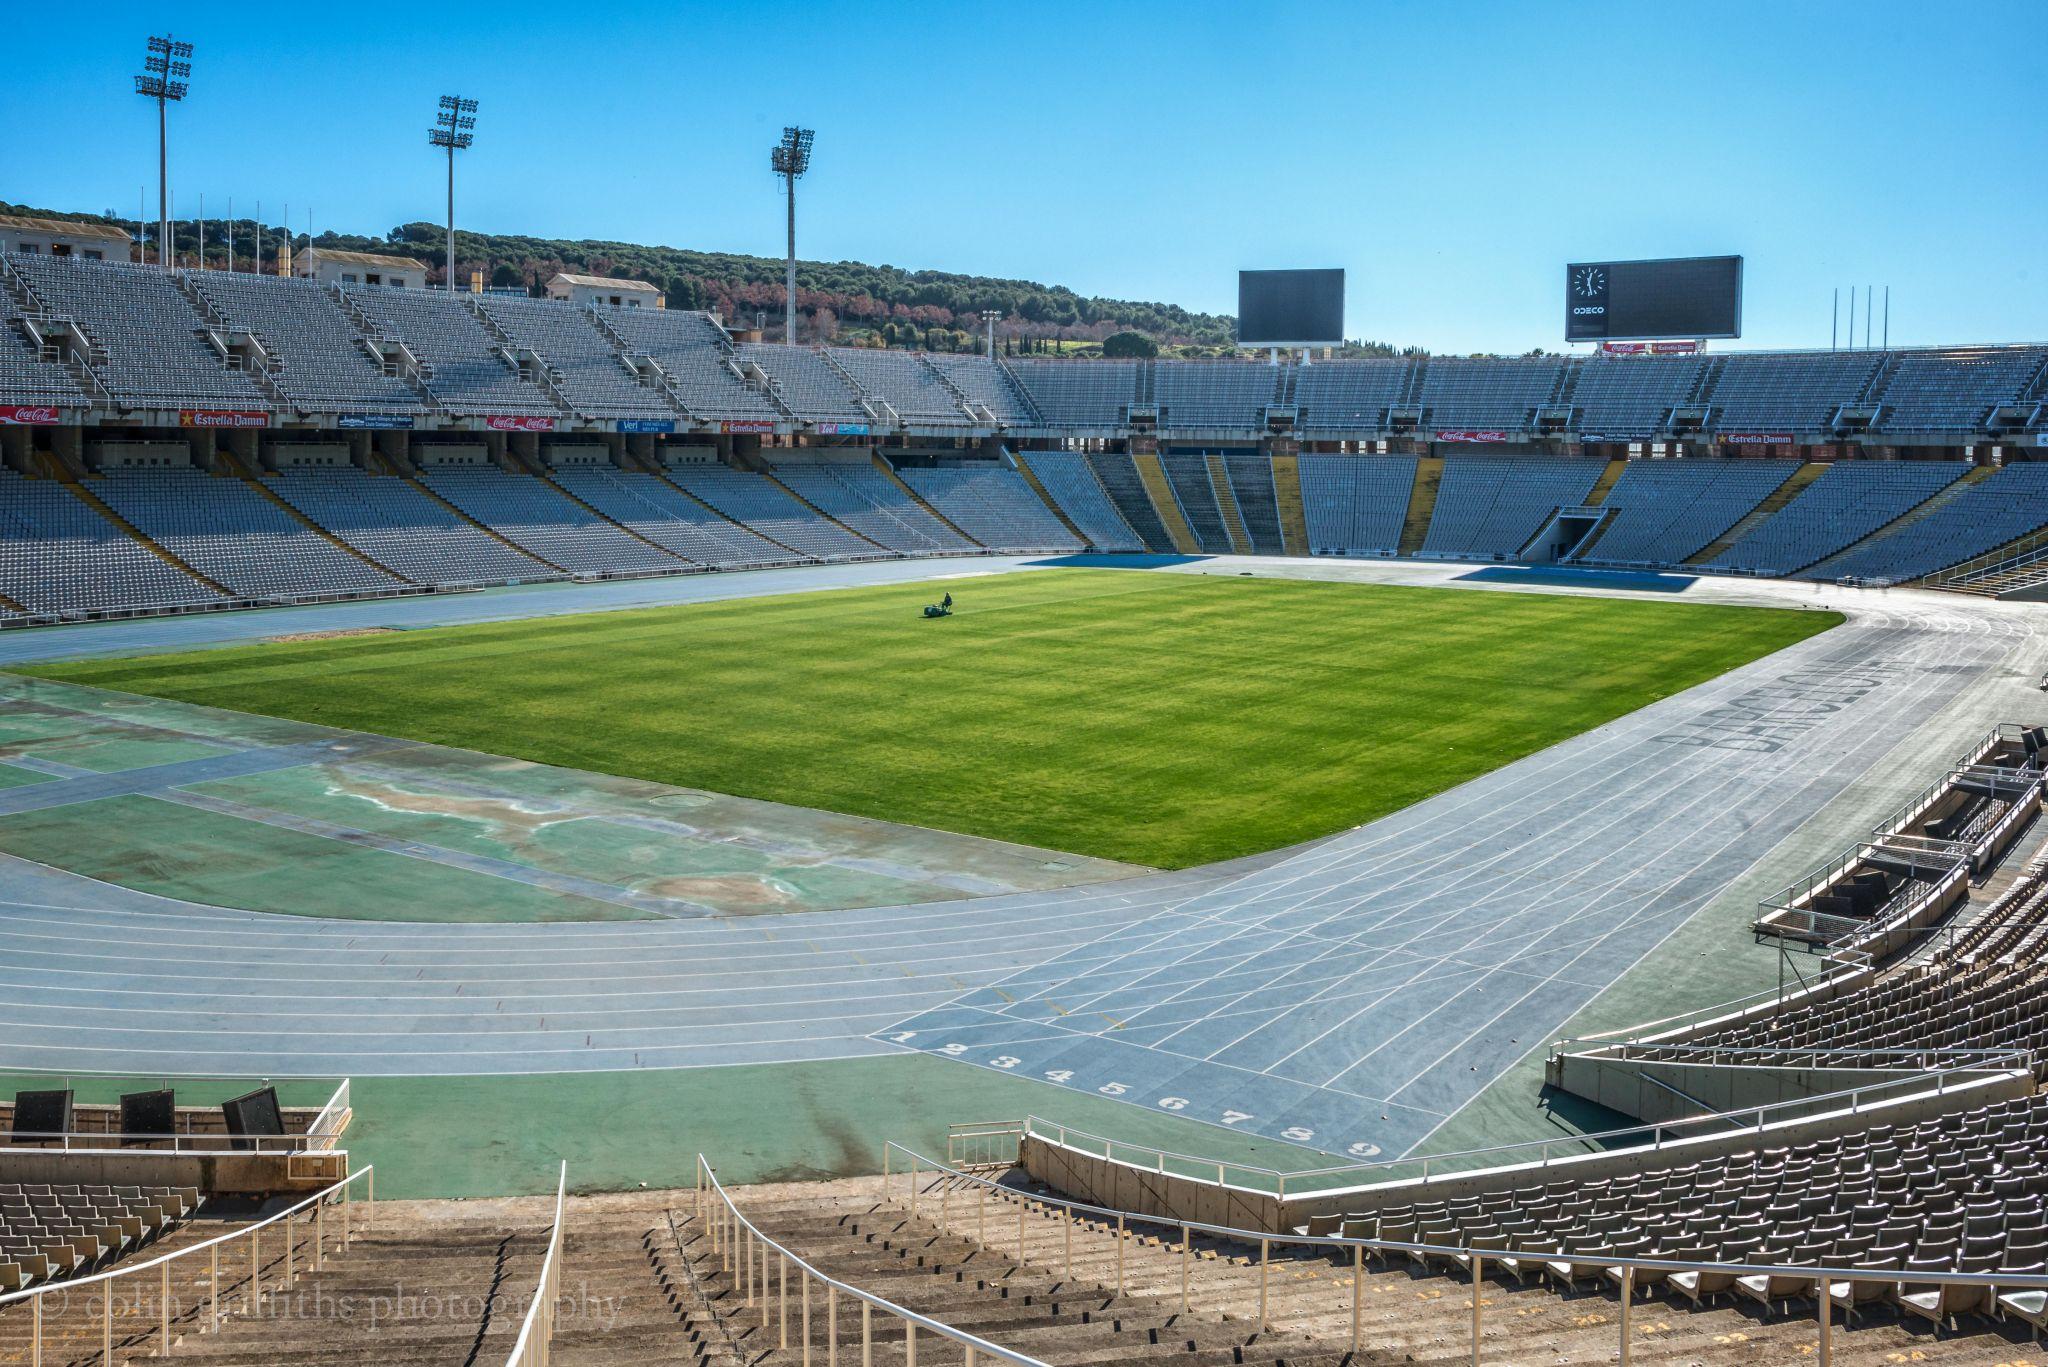 Barcelona olympic stadium, Spain